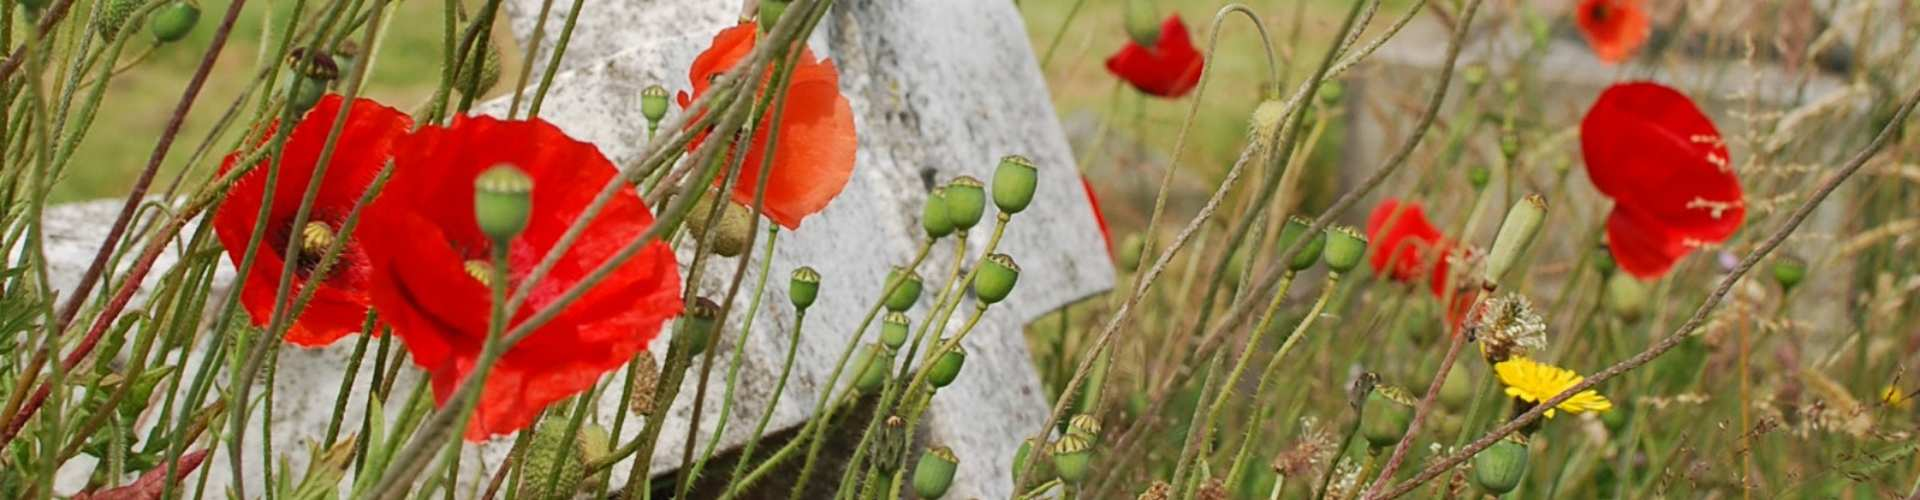 Halsbury Travel School English Literature Trip To The Somme